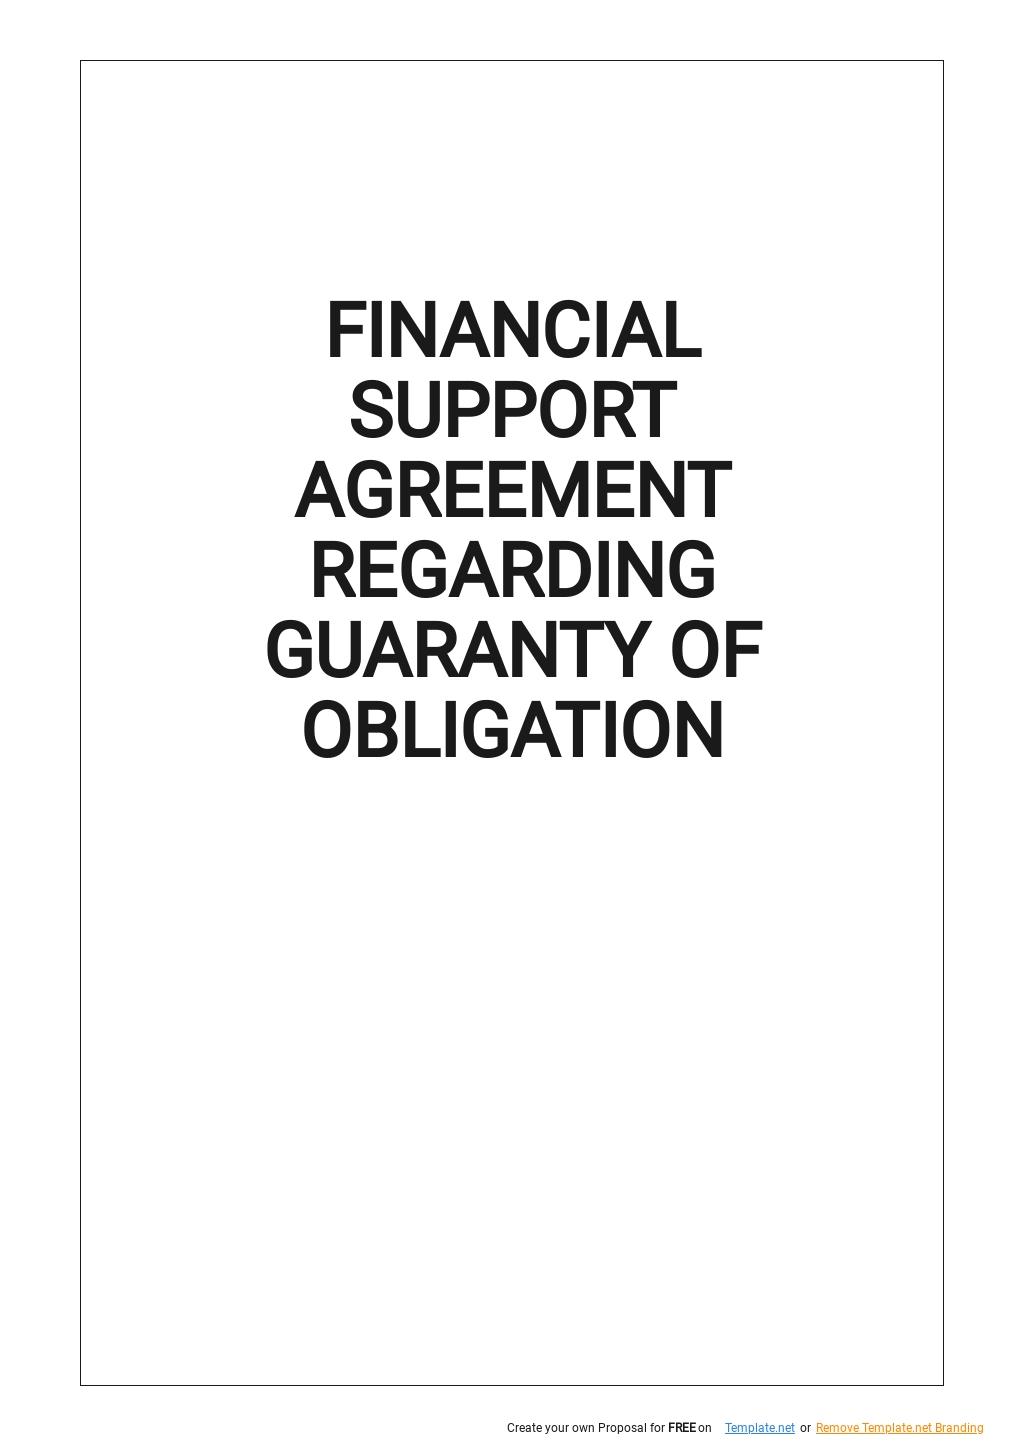 Financial Support Agreement Regarding Guaranty of Obligation Template.jpe